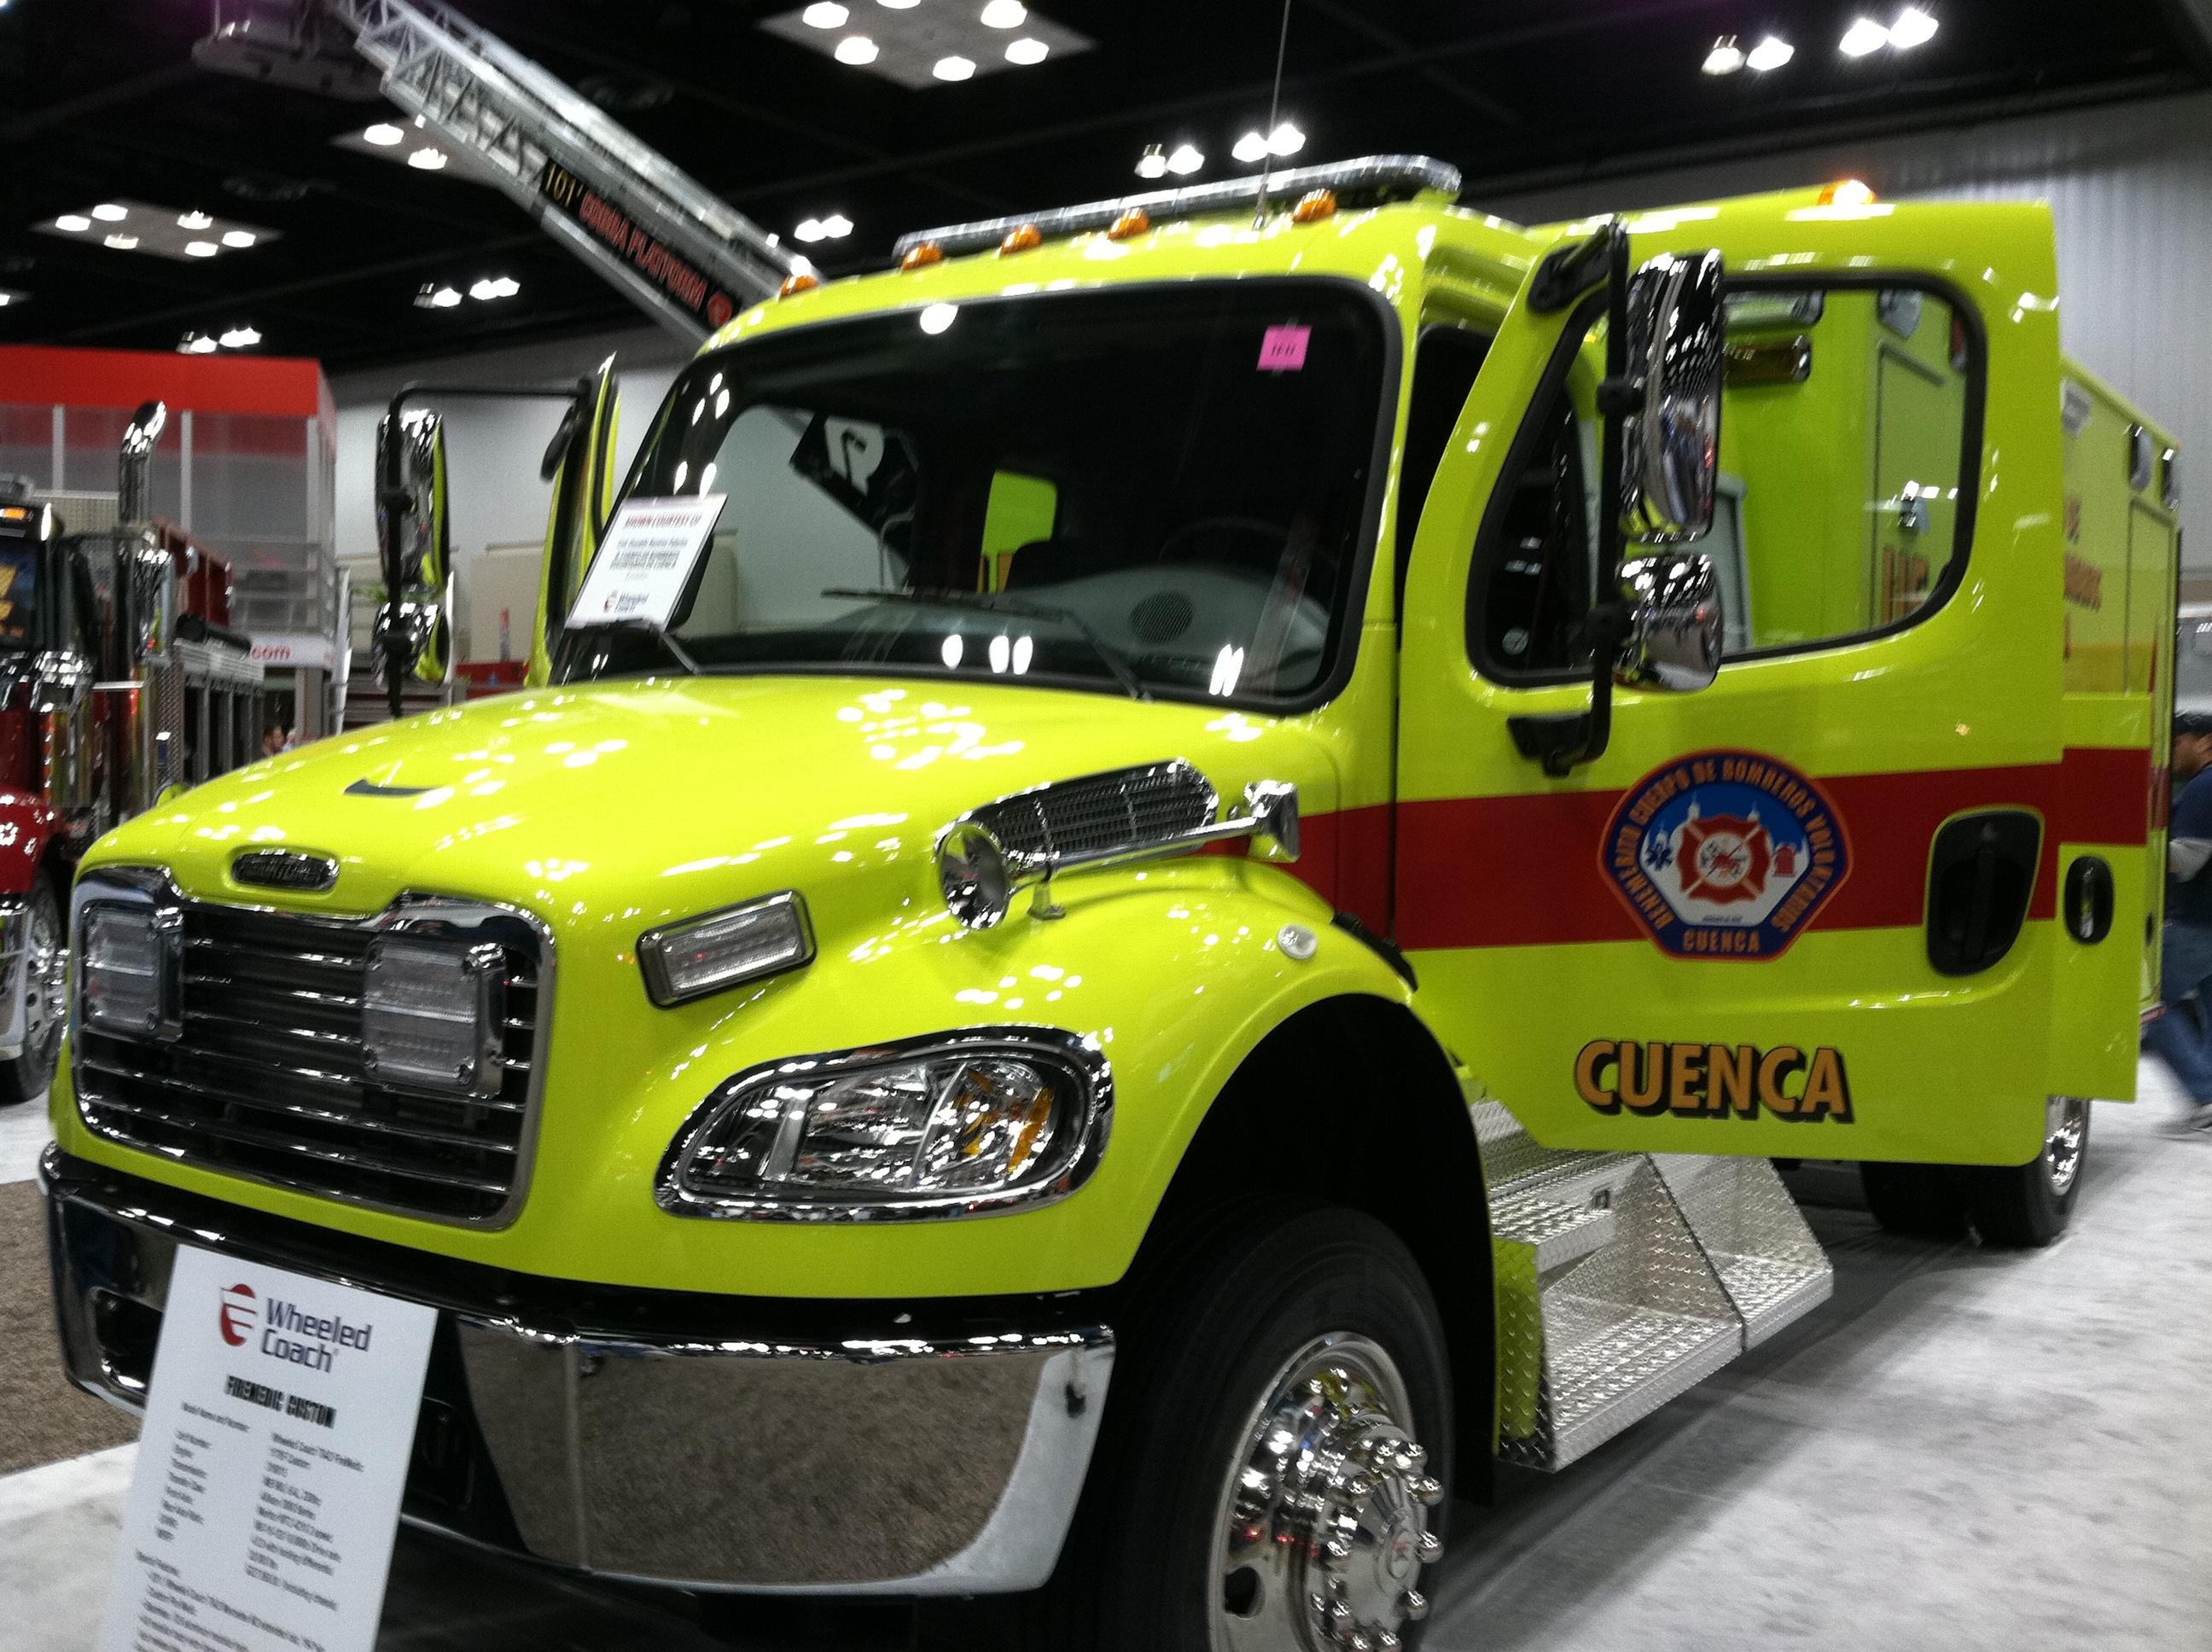 Ecuador Ambulance